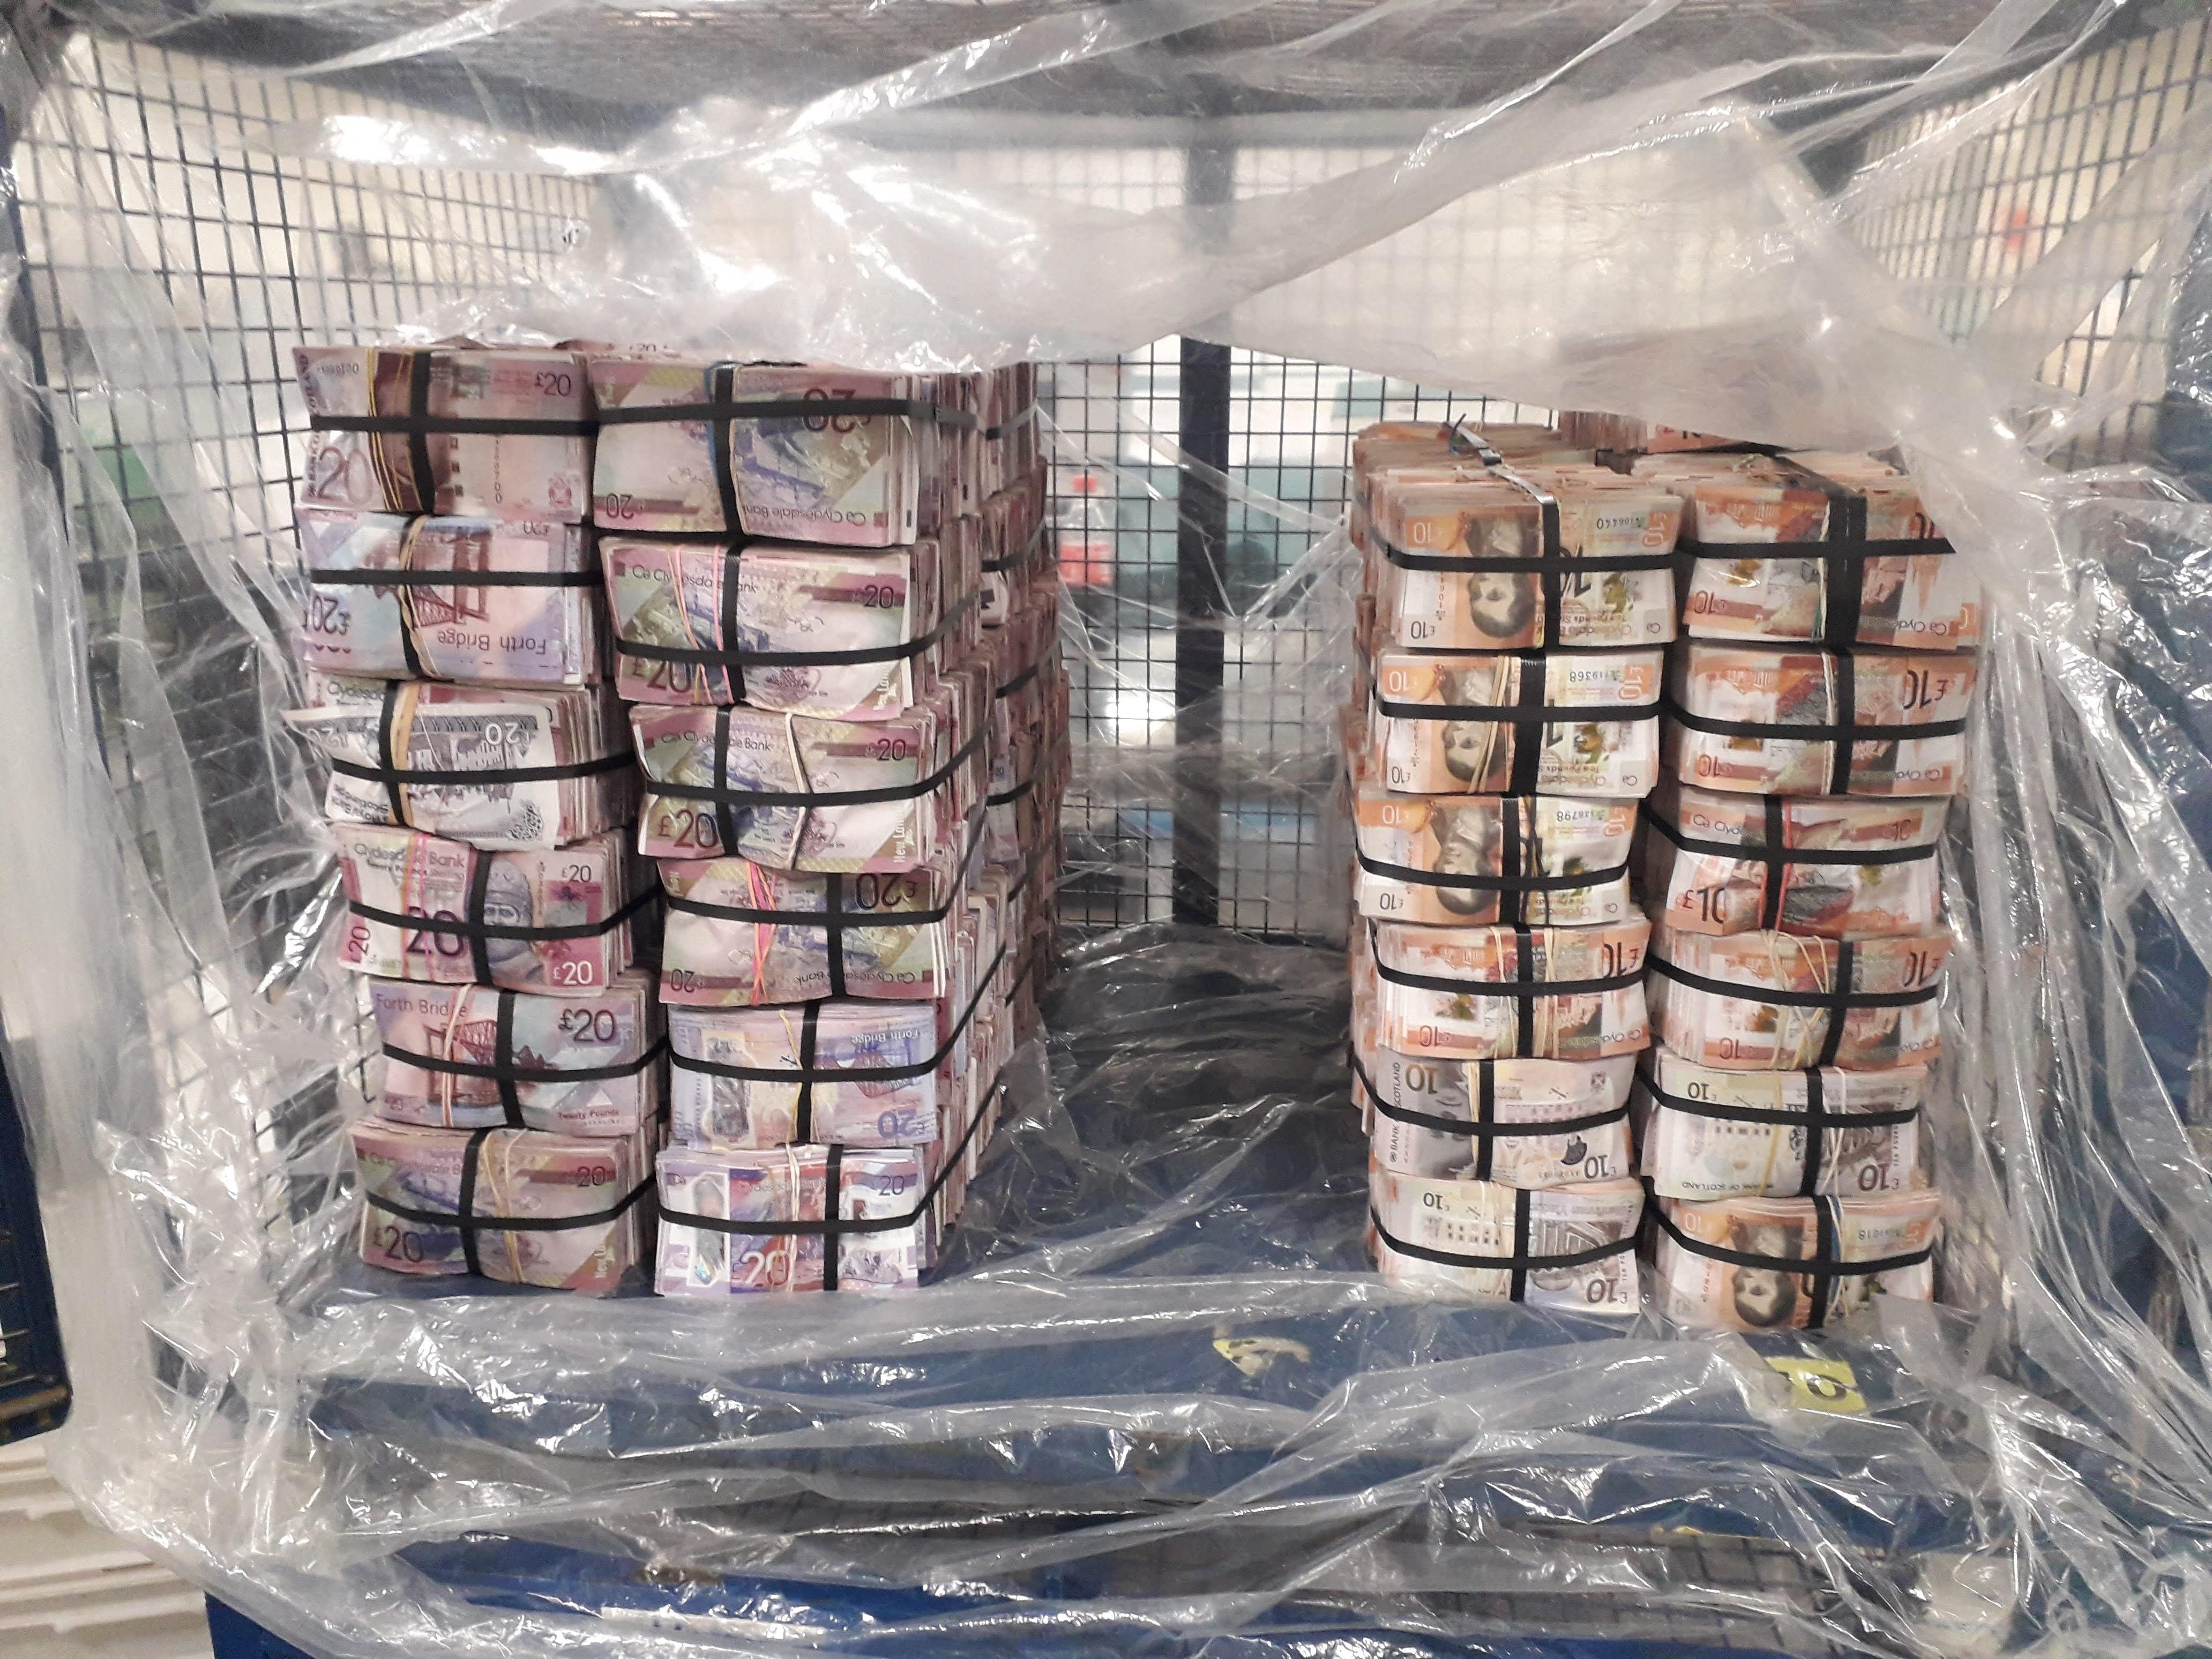 spalare bani BOR2813-2021 - Counted cash